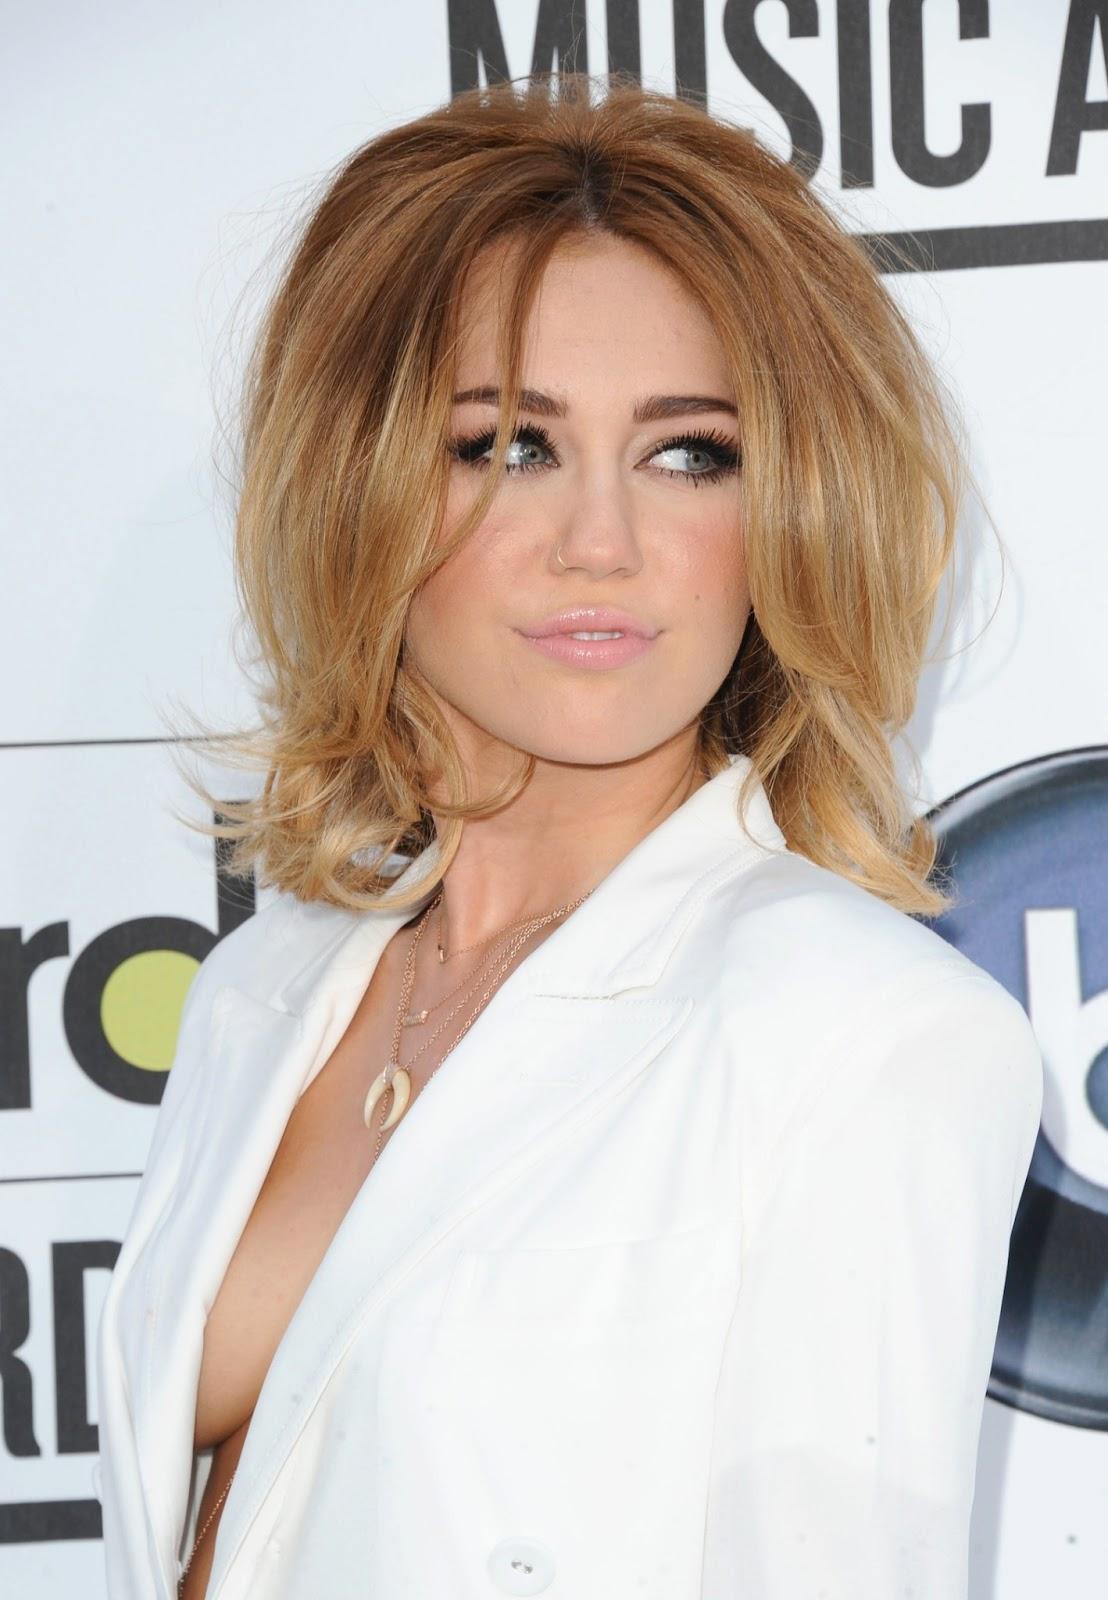 Miley cyrus boobs pics-3045